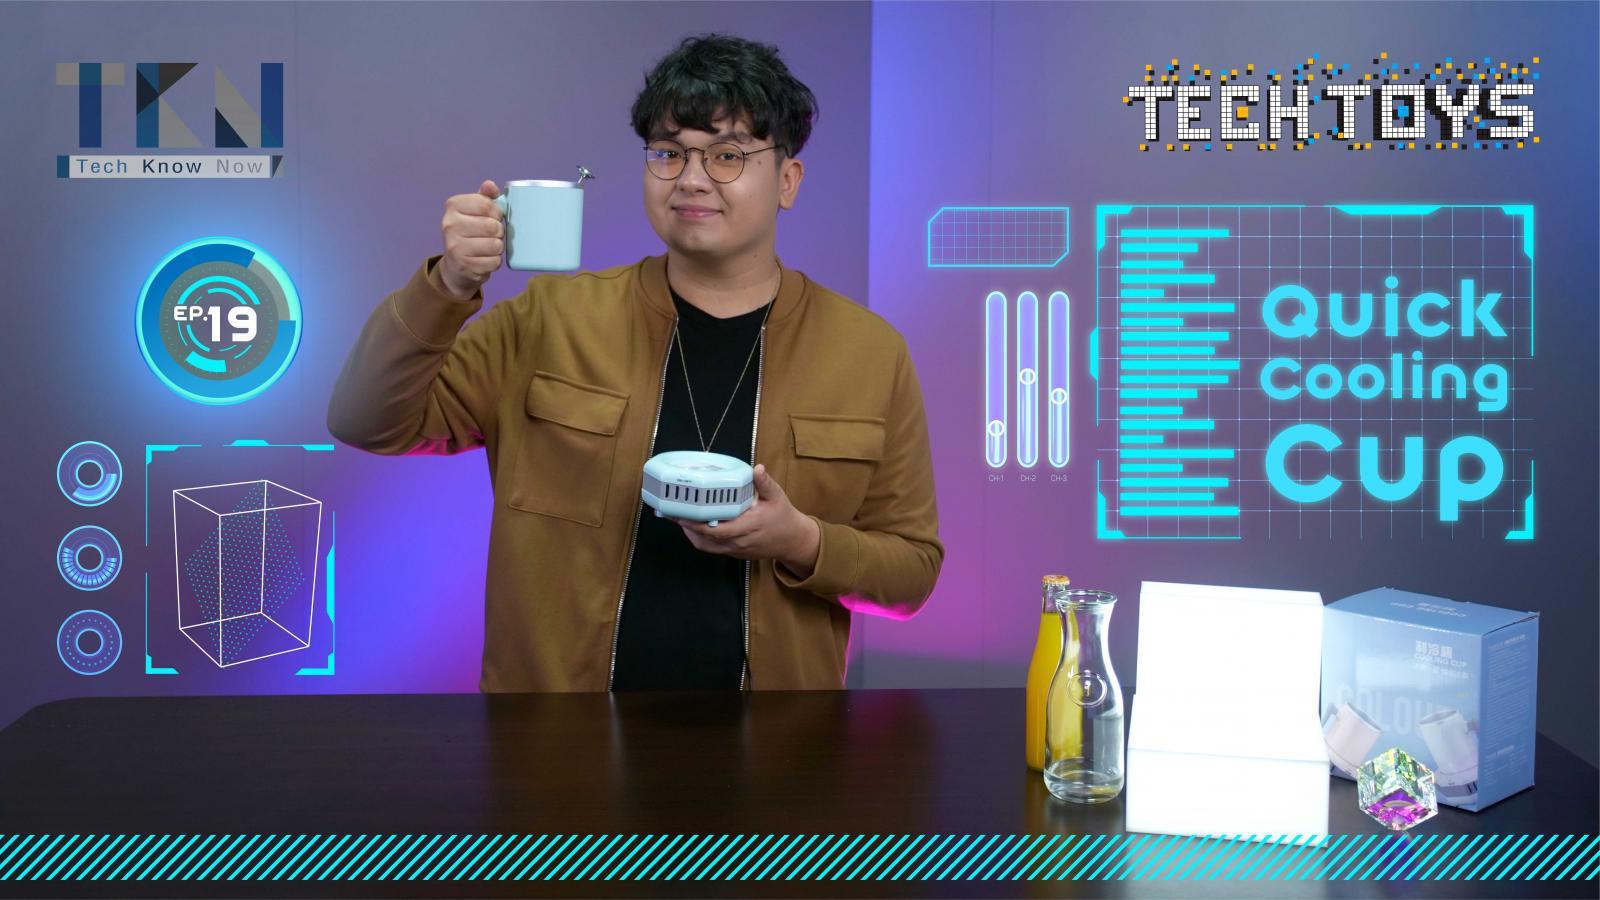 Tech Know Now EP.19 | quick cooling cup เครื่องทําน้ําแข็งไฟฟ้า | PPTV HD 36